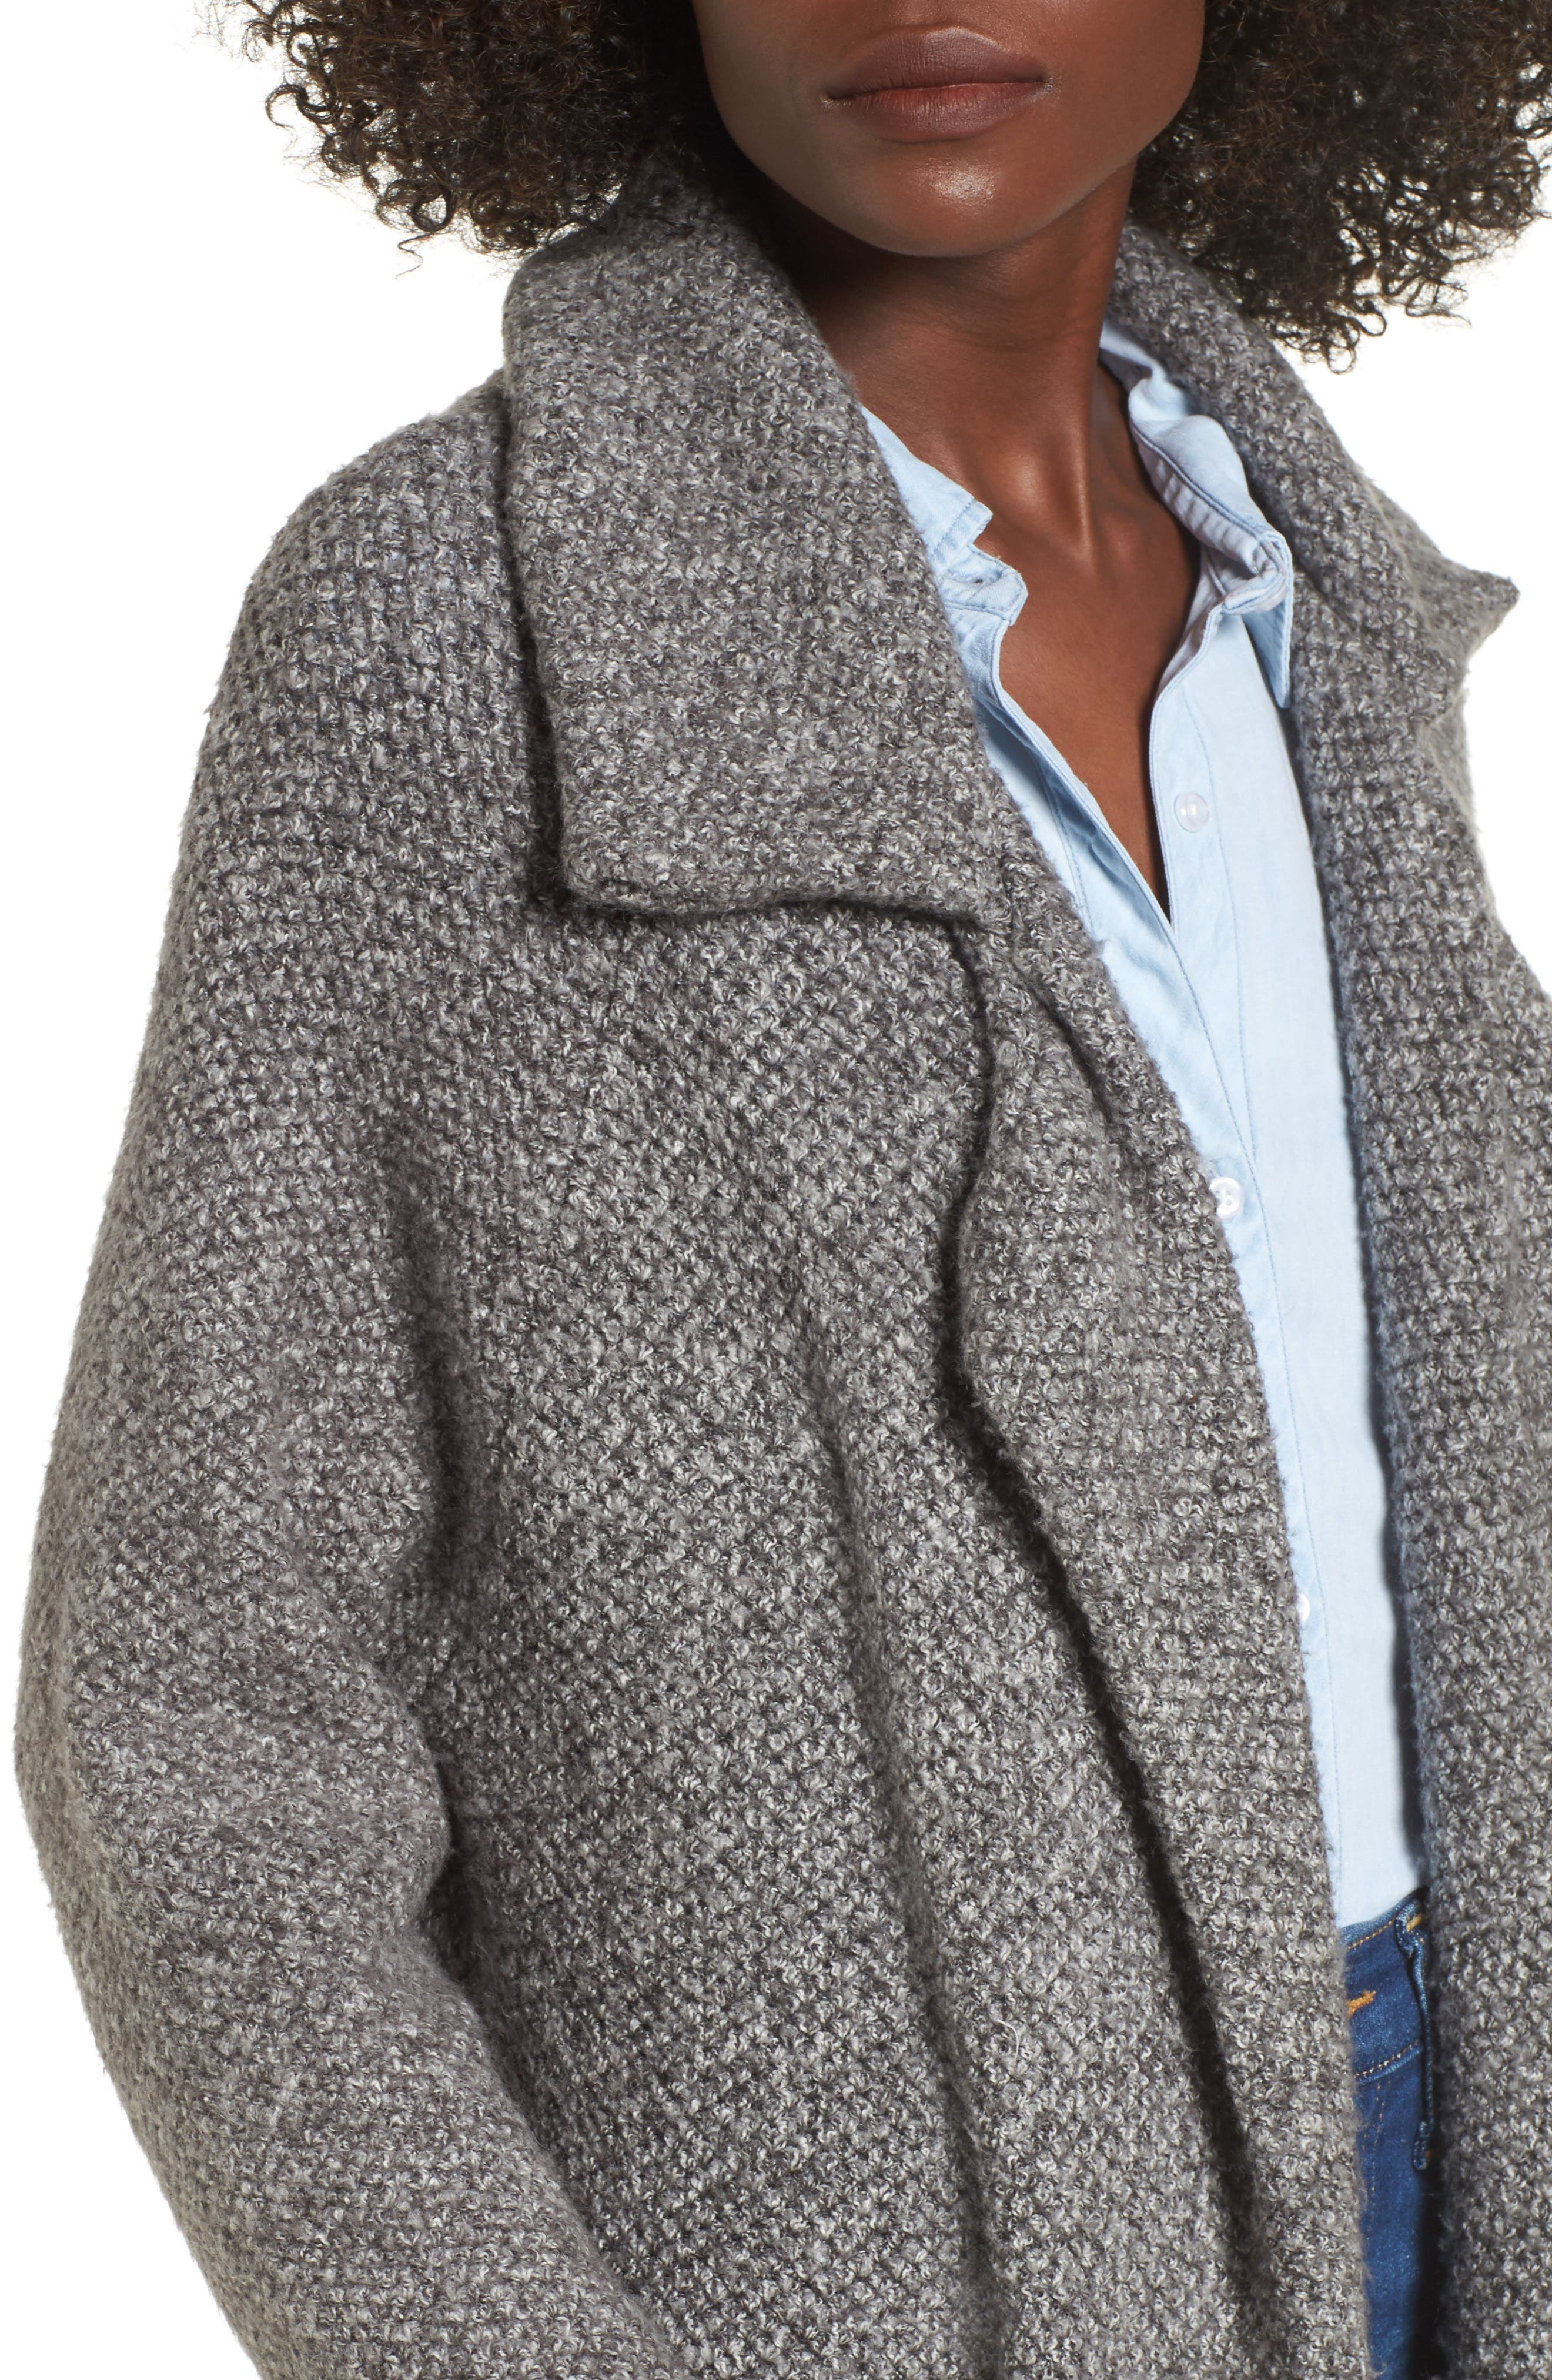 Kala Knit Sweater Jacket,                             Alternate thumbnail 4, color,                             Grey